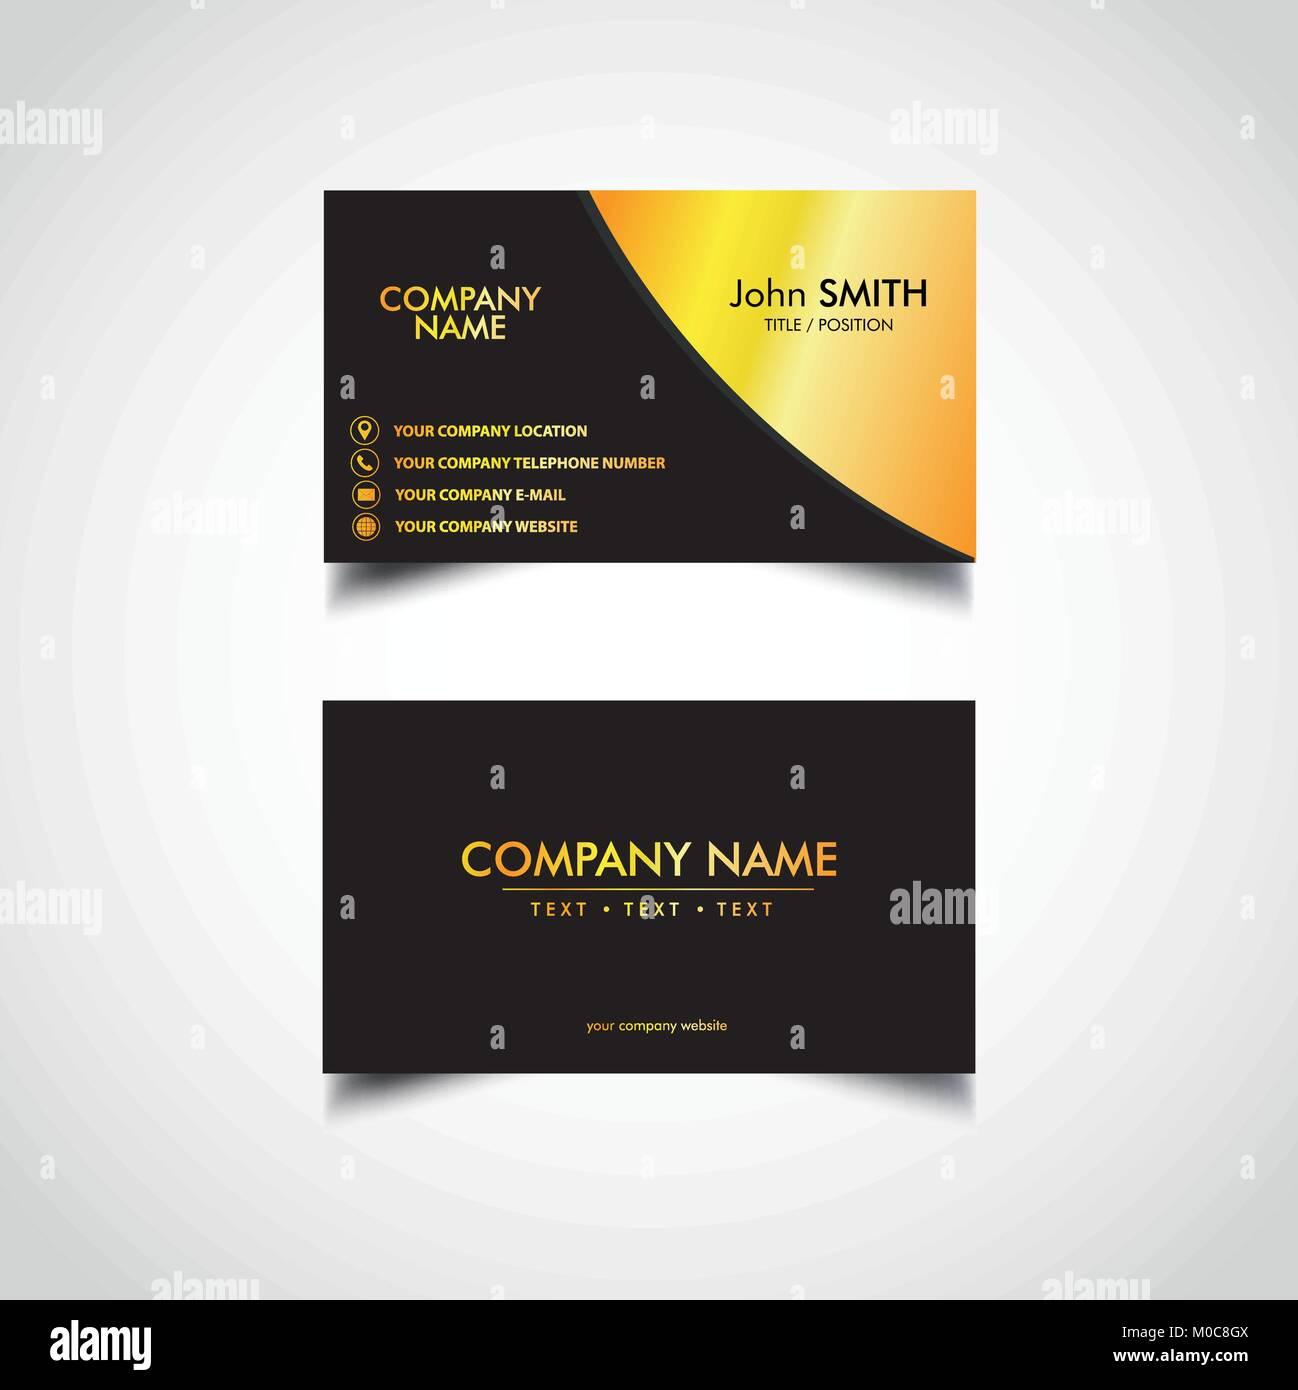 Golden Business Card Template, Vector, Illustration, Eps File ...